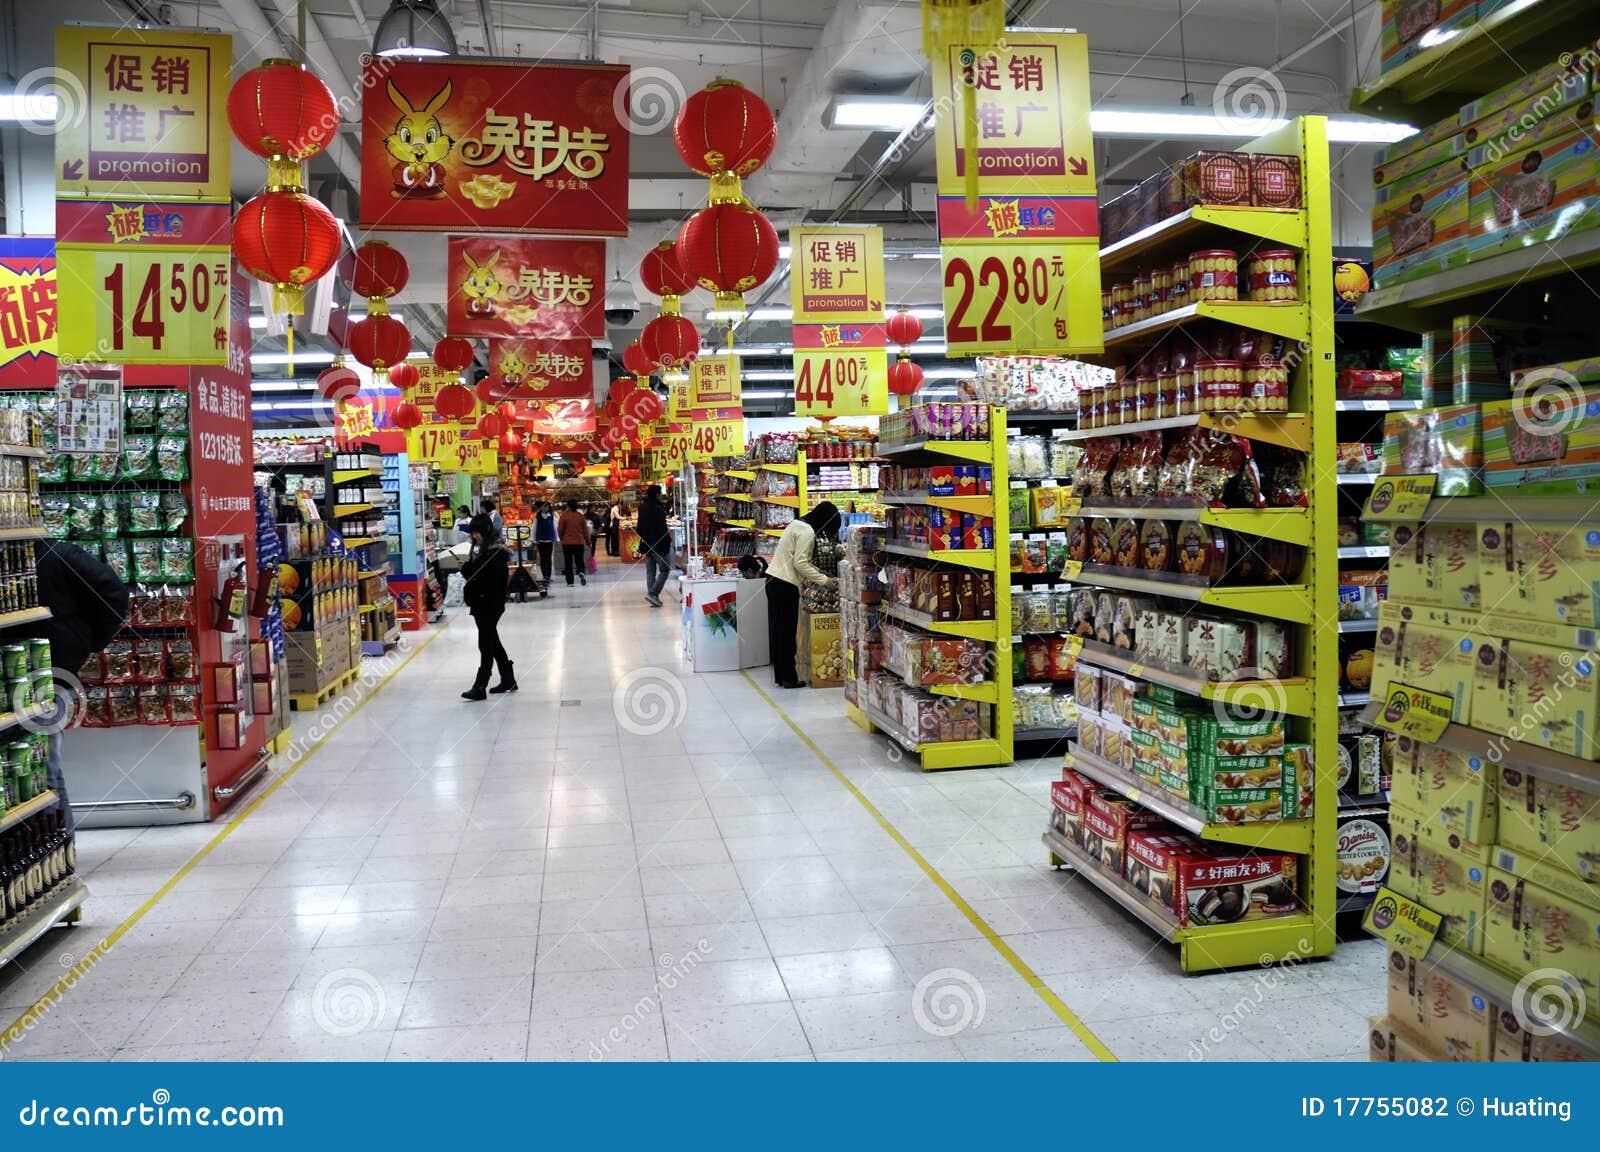 Supermarket in China